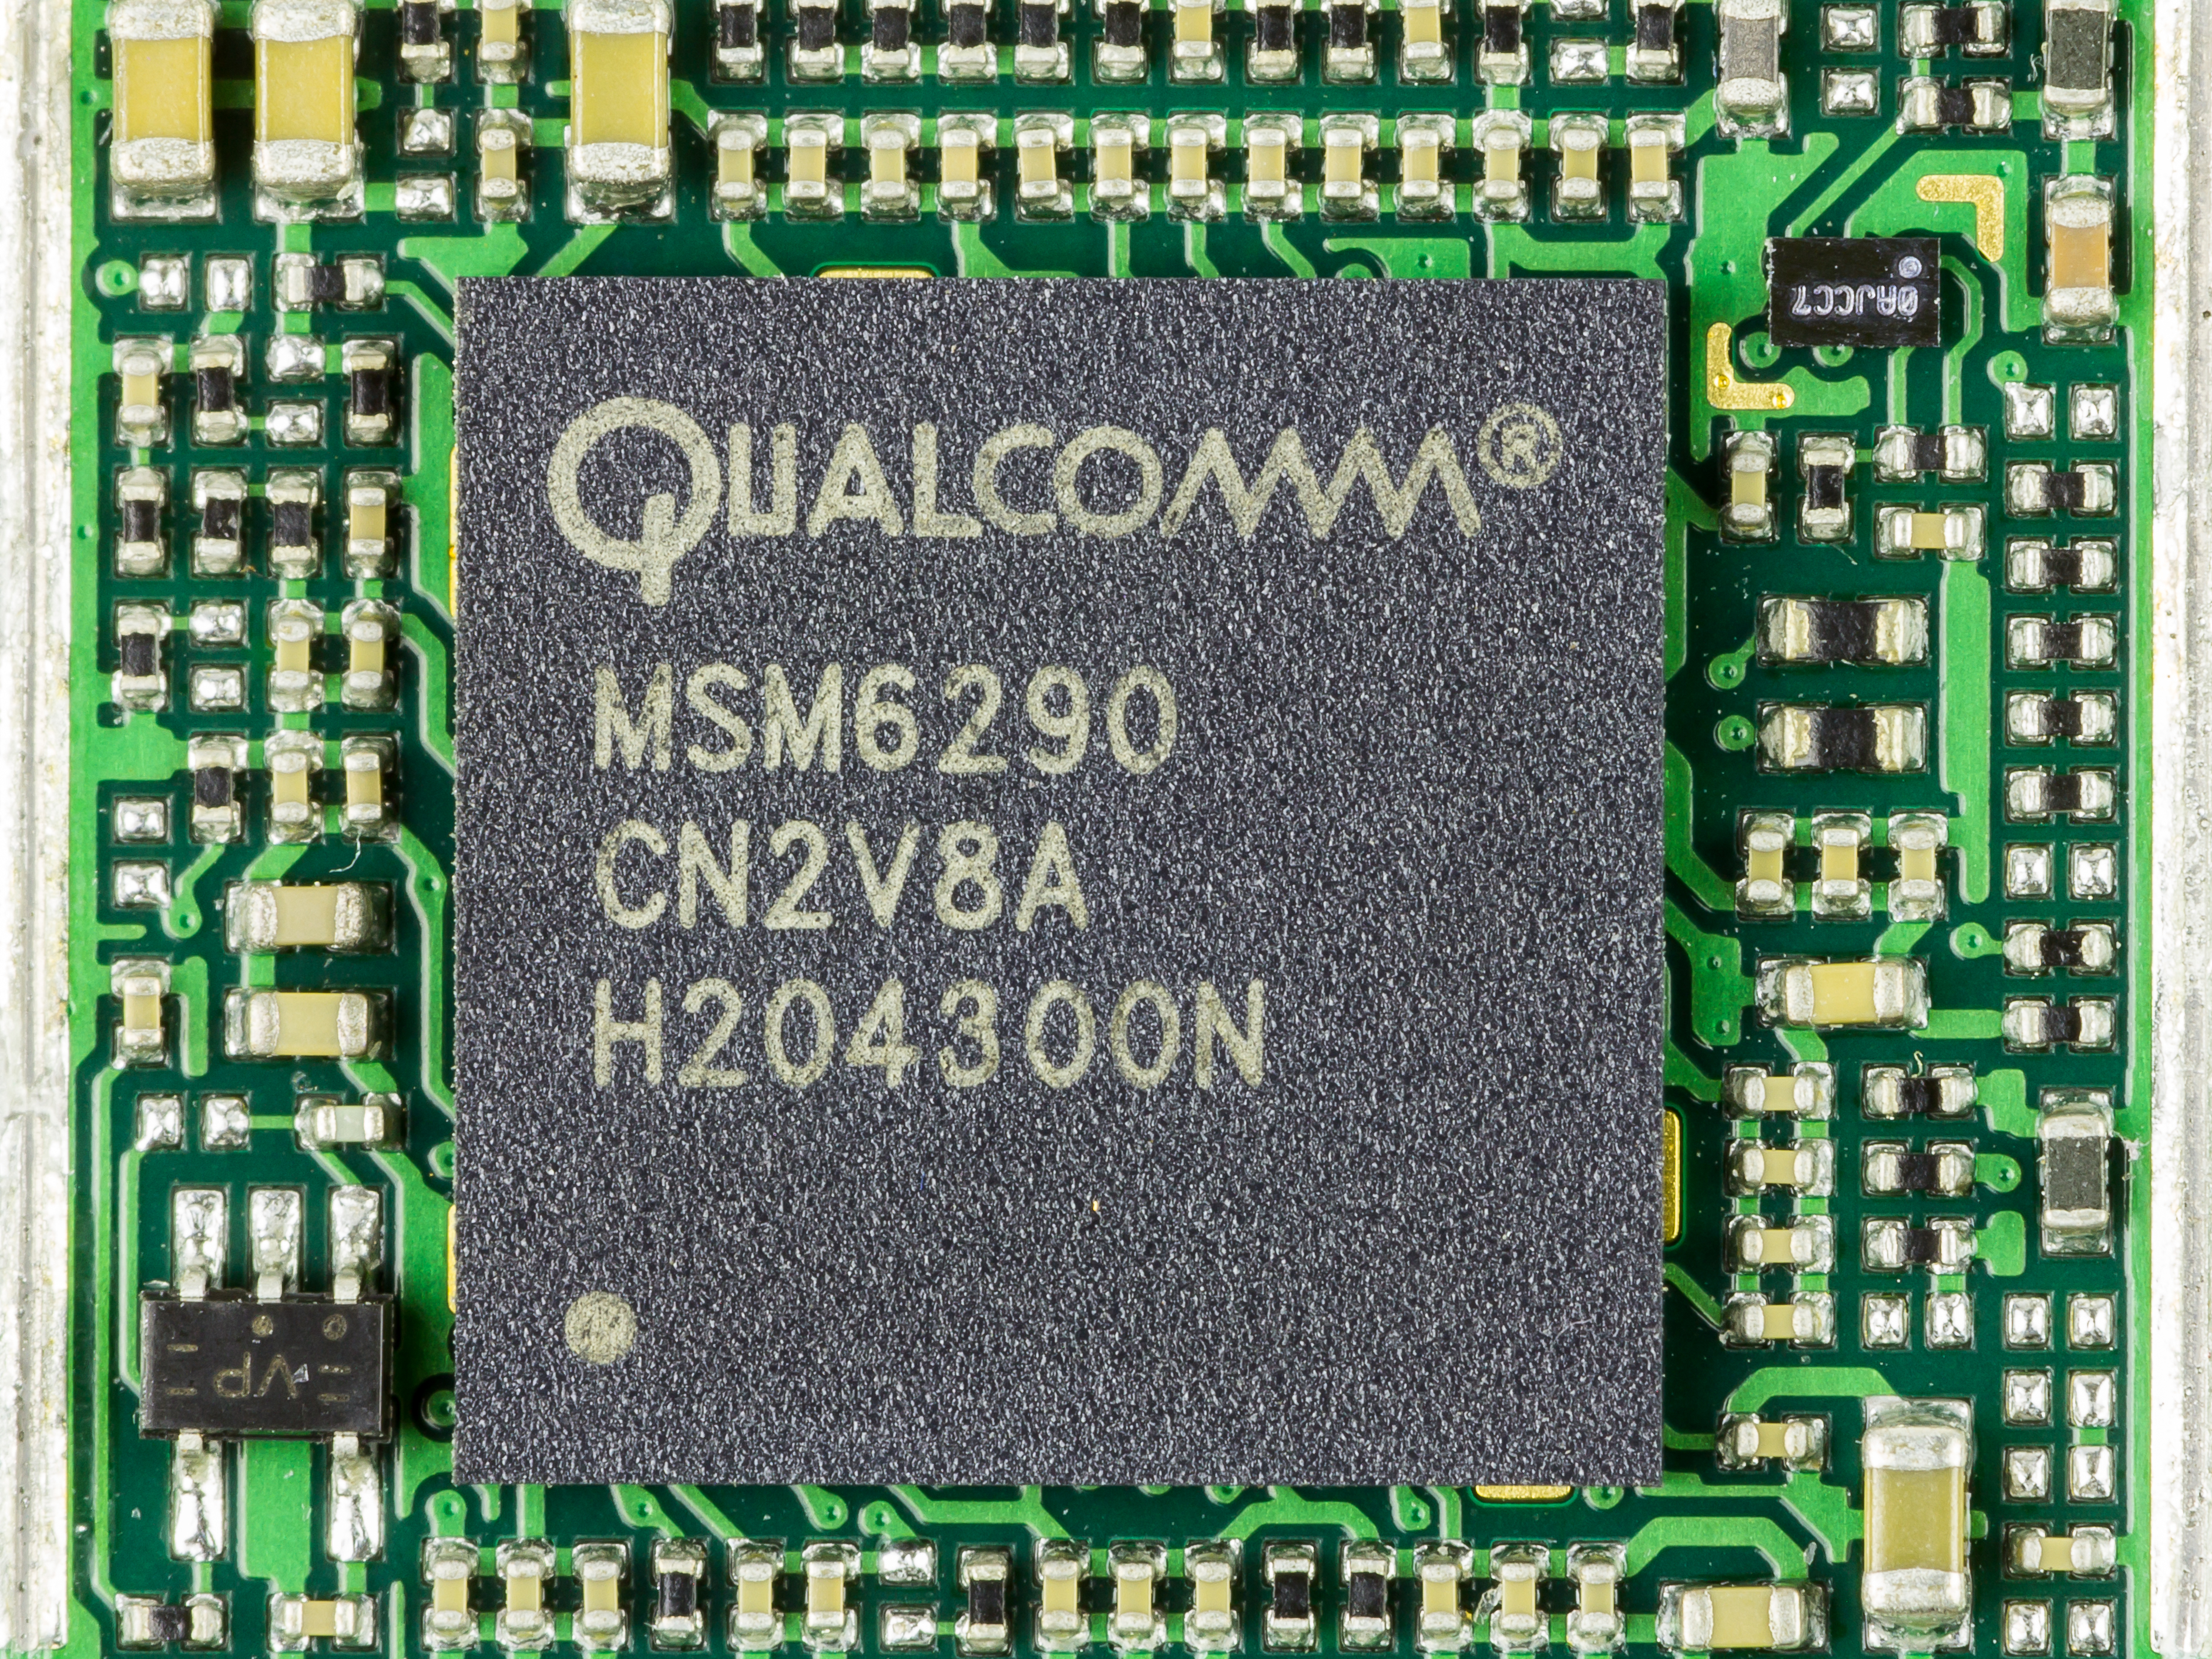 QUALCOMM MSM6290 WINDOWS 7 X64 DRIVER